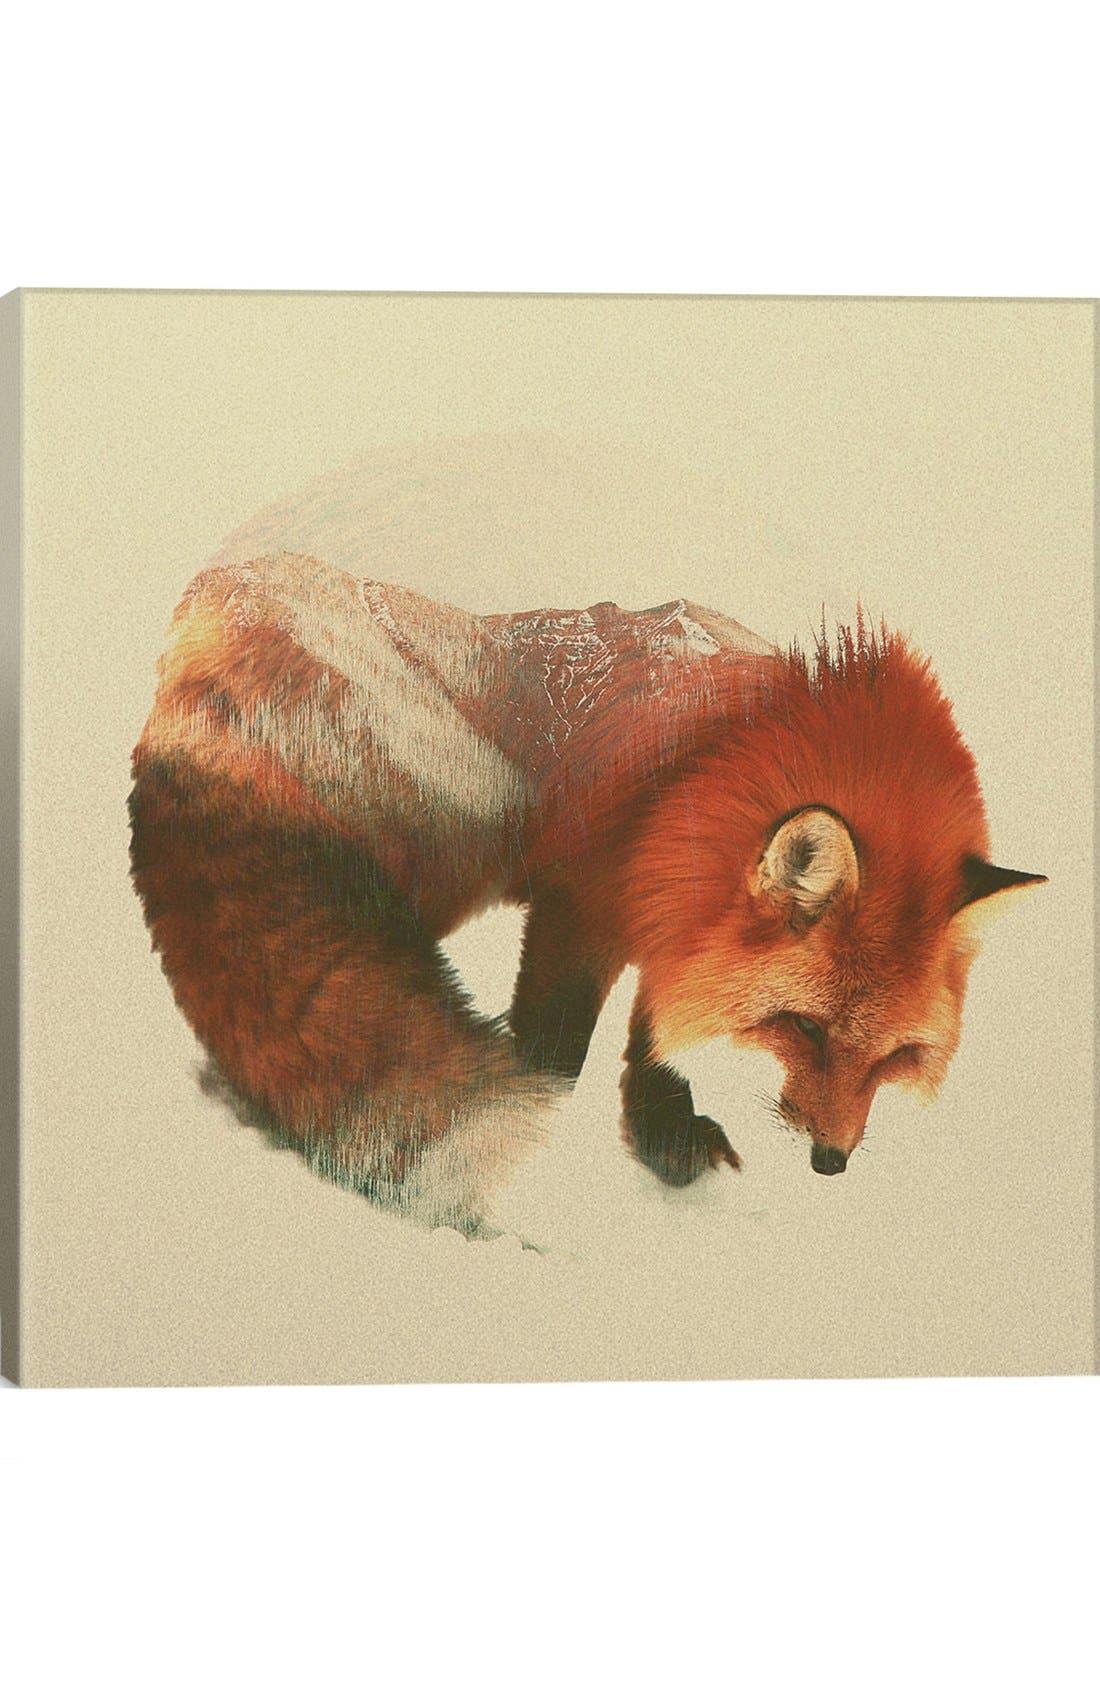 Alternate Image 1 Selected - iCanvas 'Snow Fox' Giclée Print Canvas Art